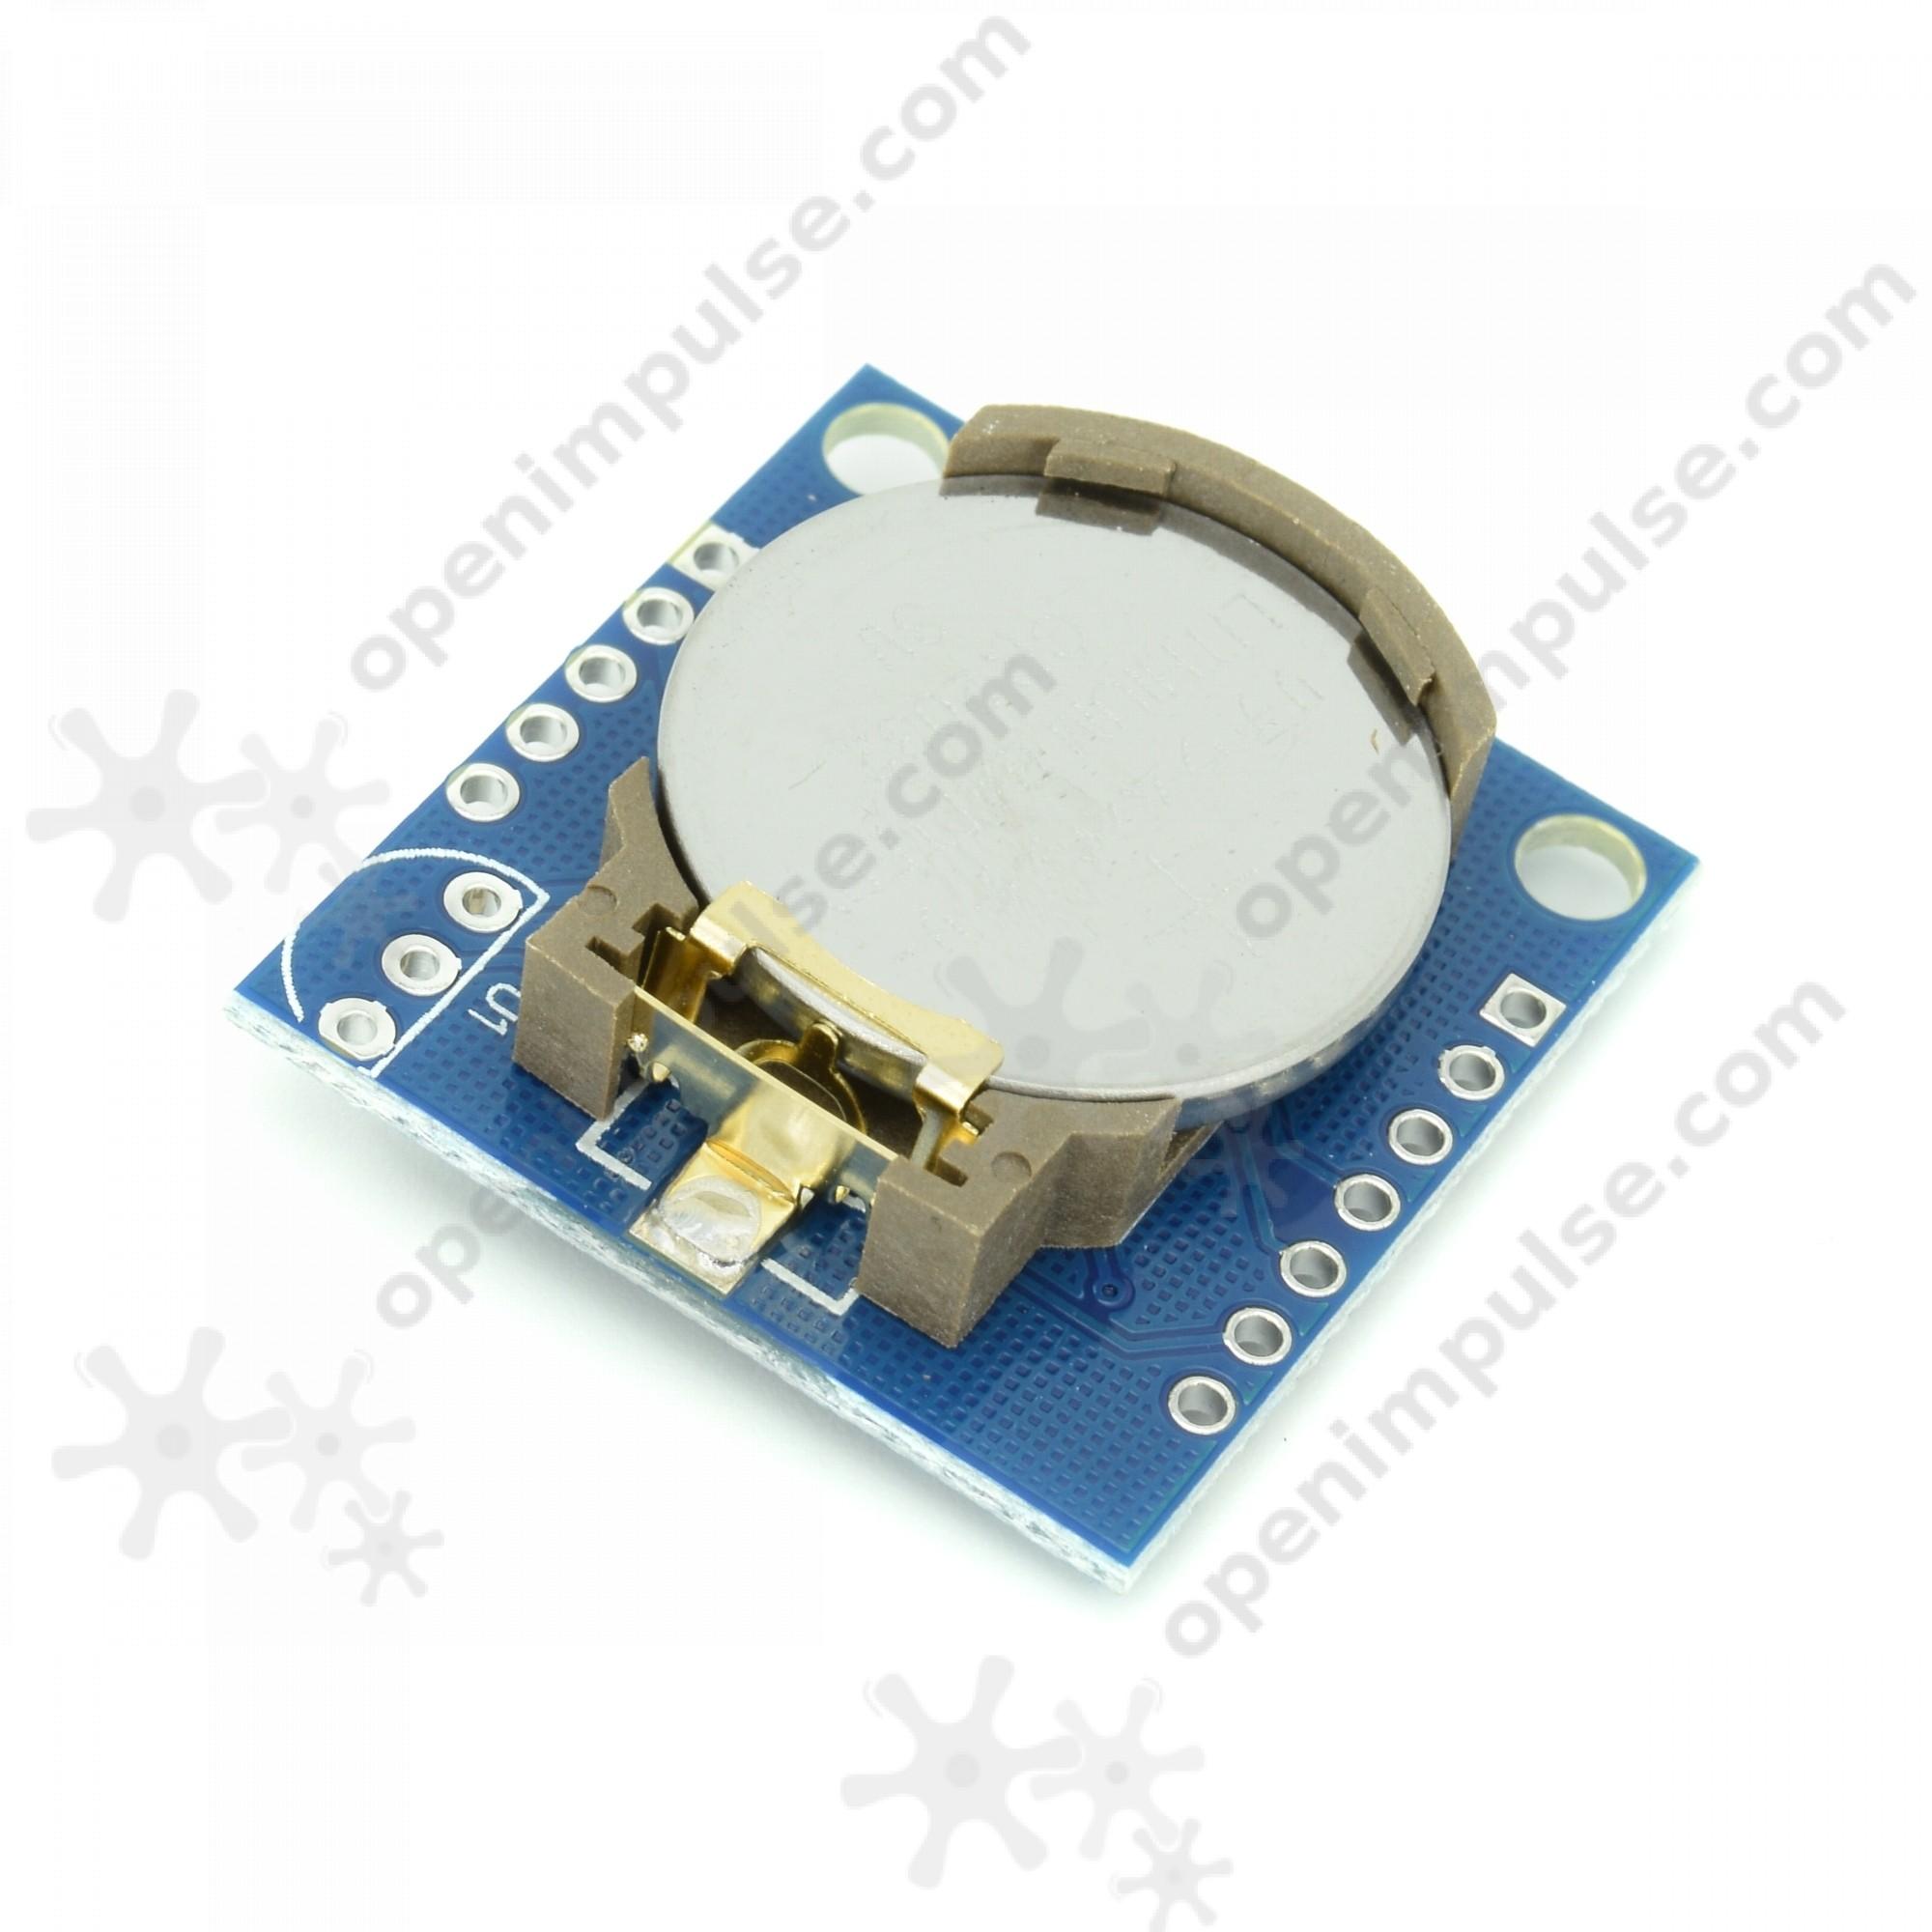 Ds1307 Real Time Clock Module Open Impulseopen Impulse Ds1307realtimeclockschematic